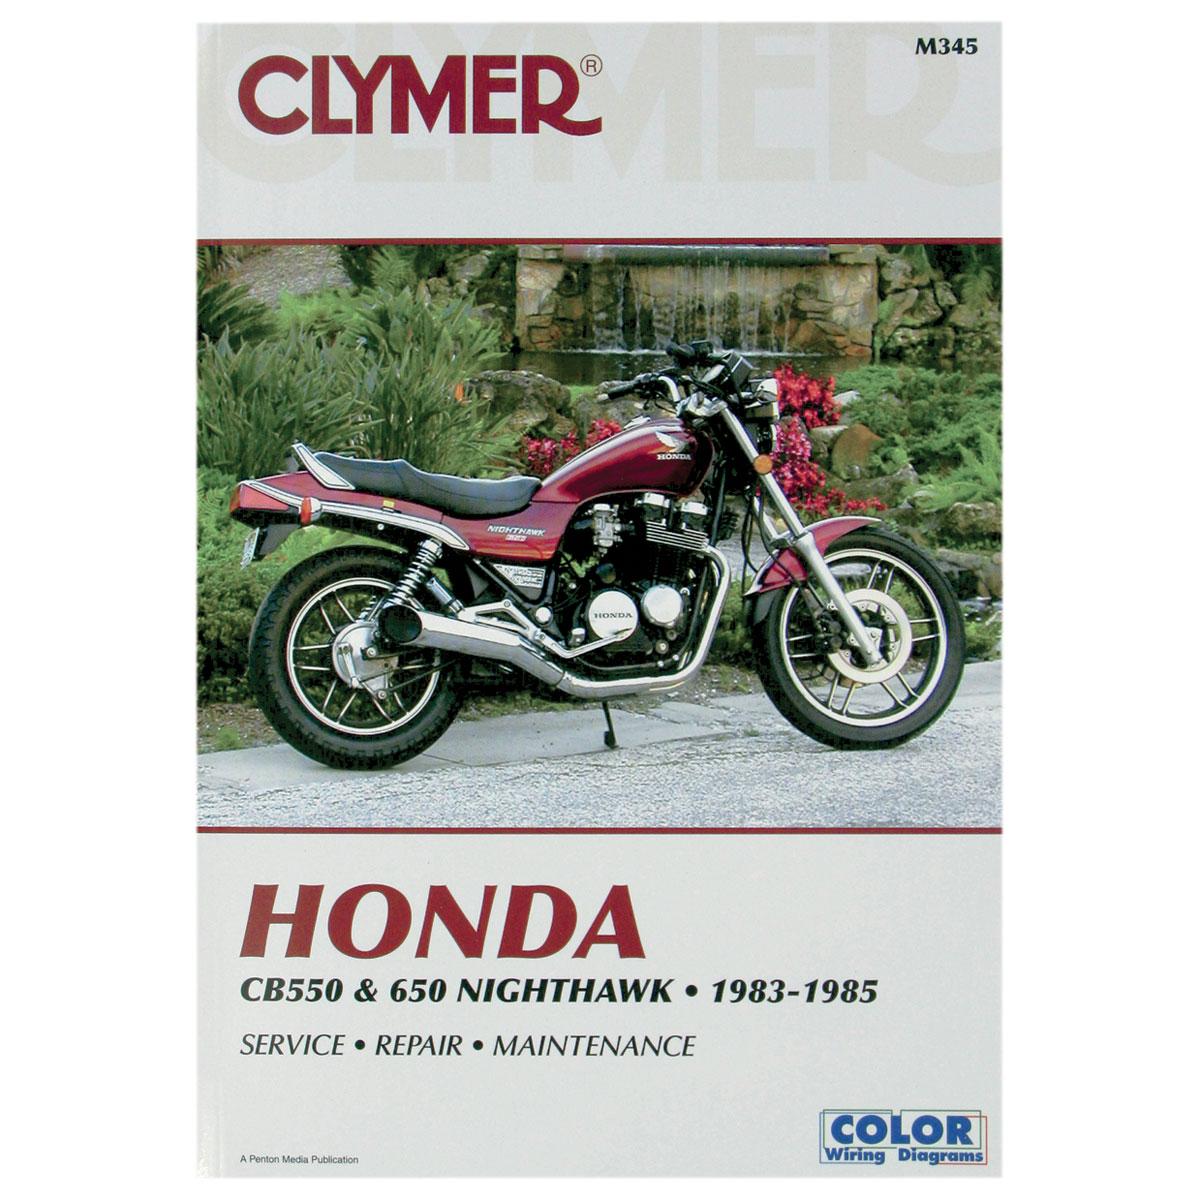 Wiring Schematic For A 1983 650 Nighthawk Diagram Libraries Clymer Honda Motorcycle Repair Manual 181 2303 Ju0026p Cyclesclymer